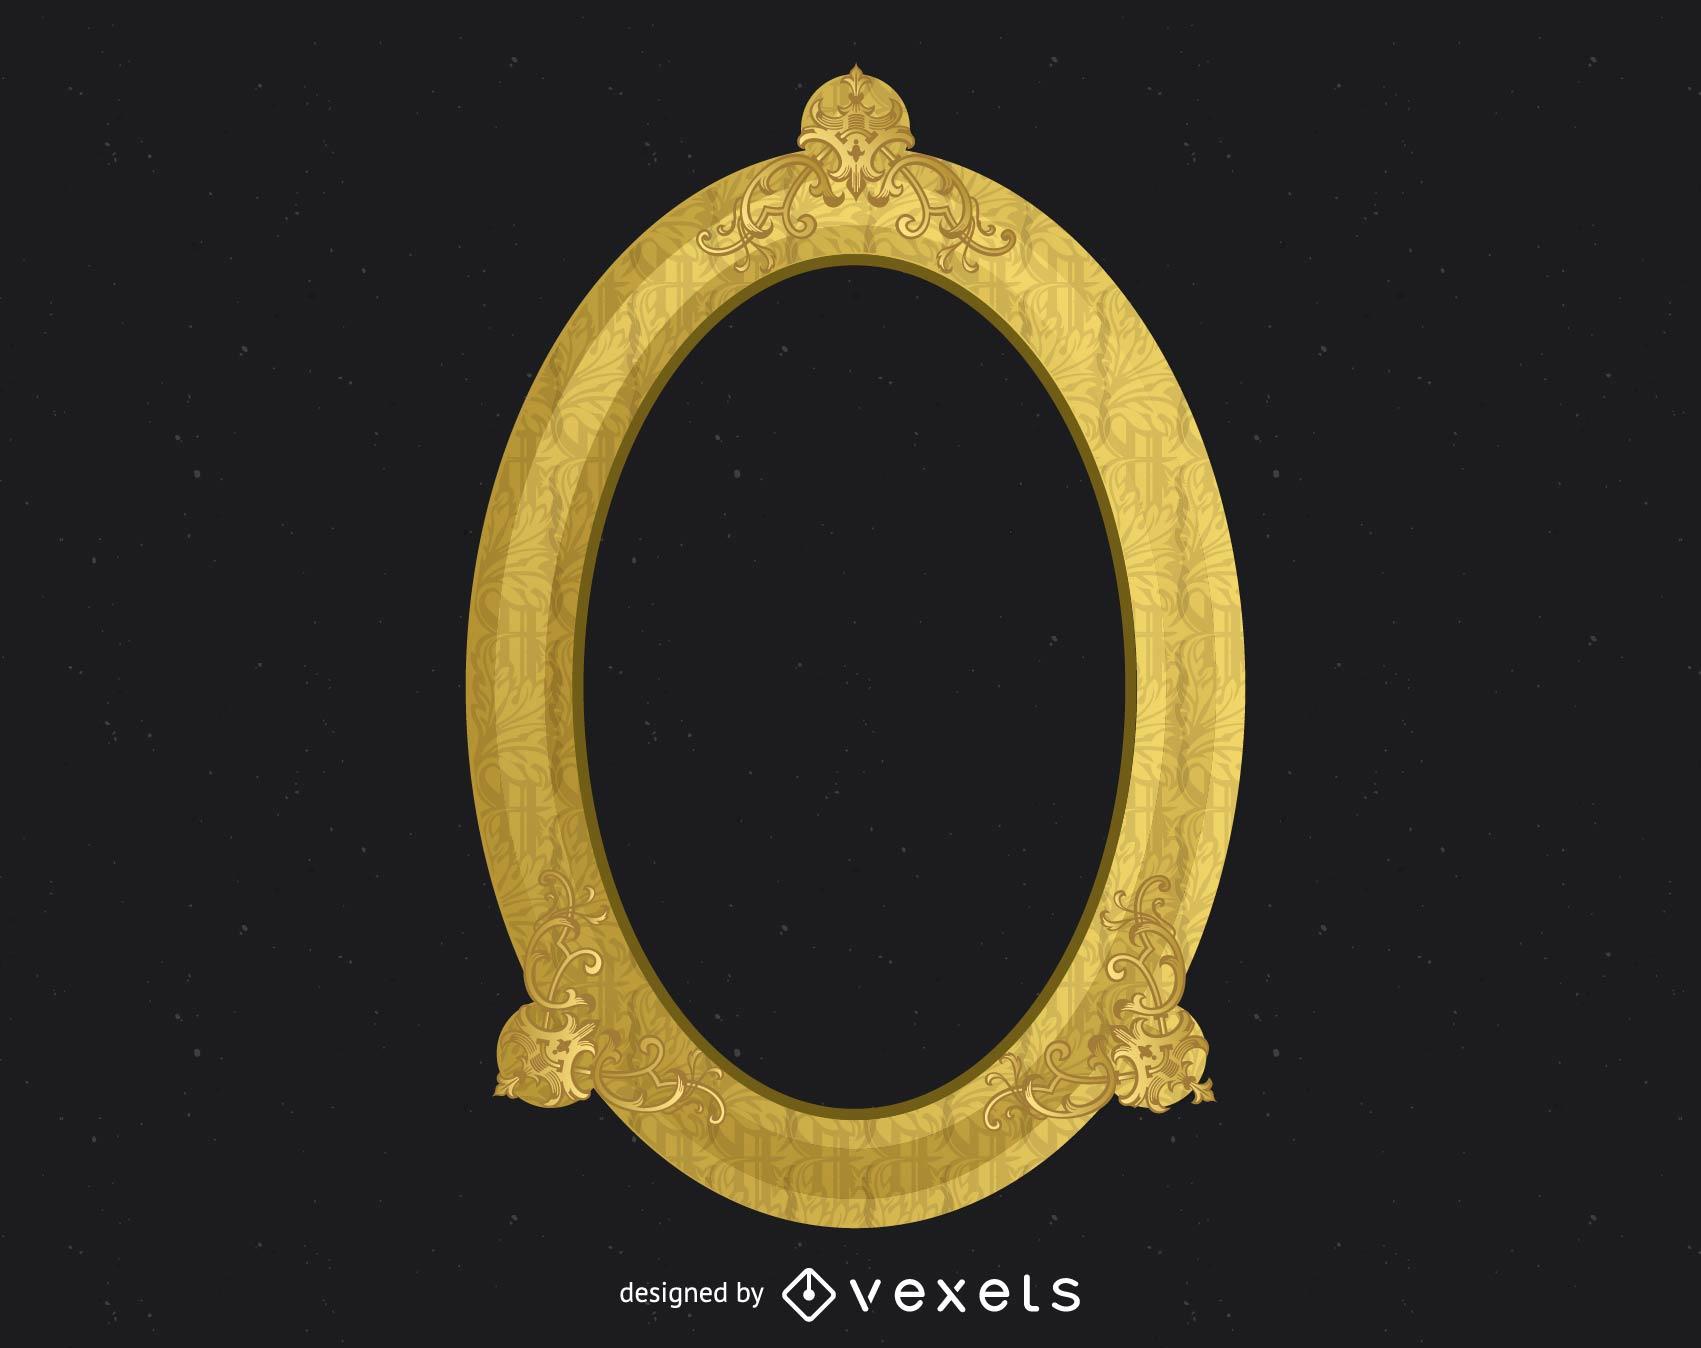 Marco de oro adornado antiguo - Descargar vector